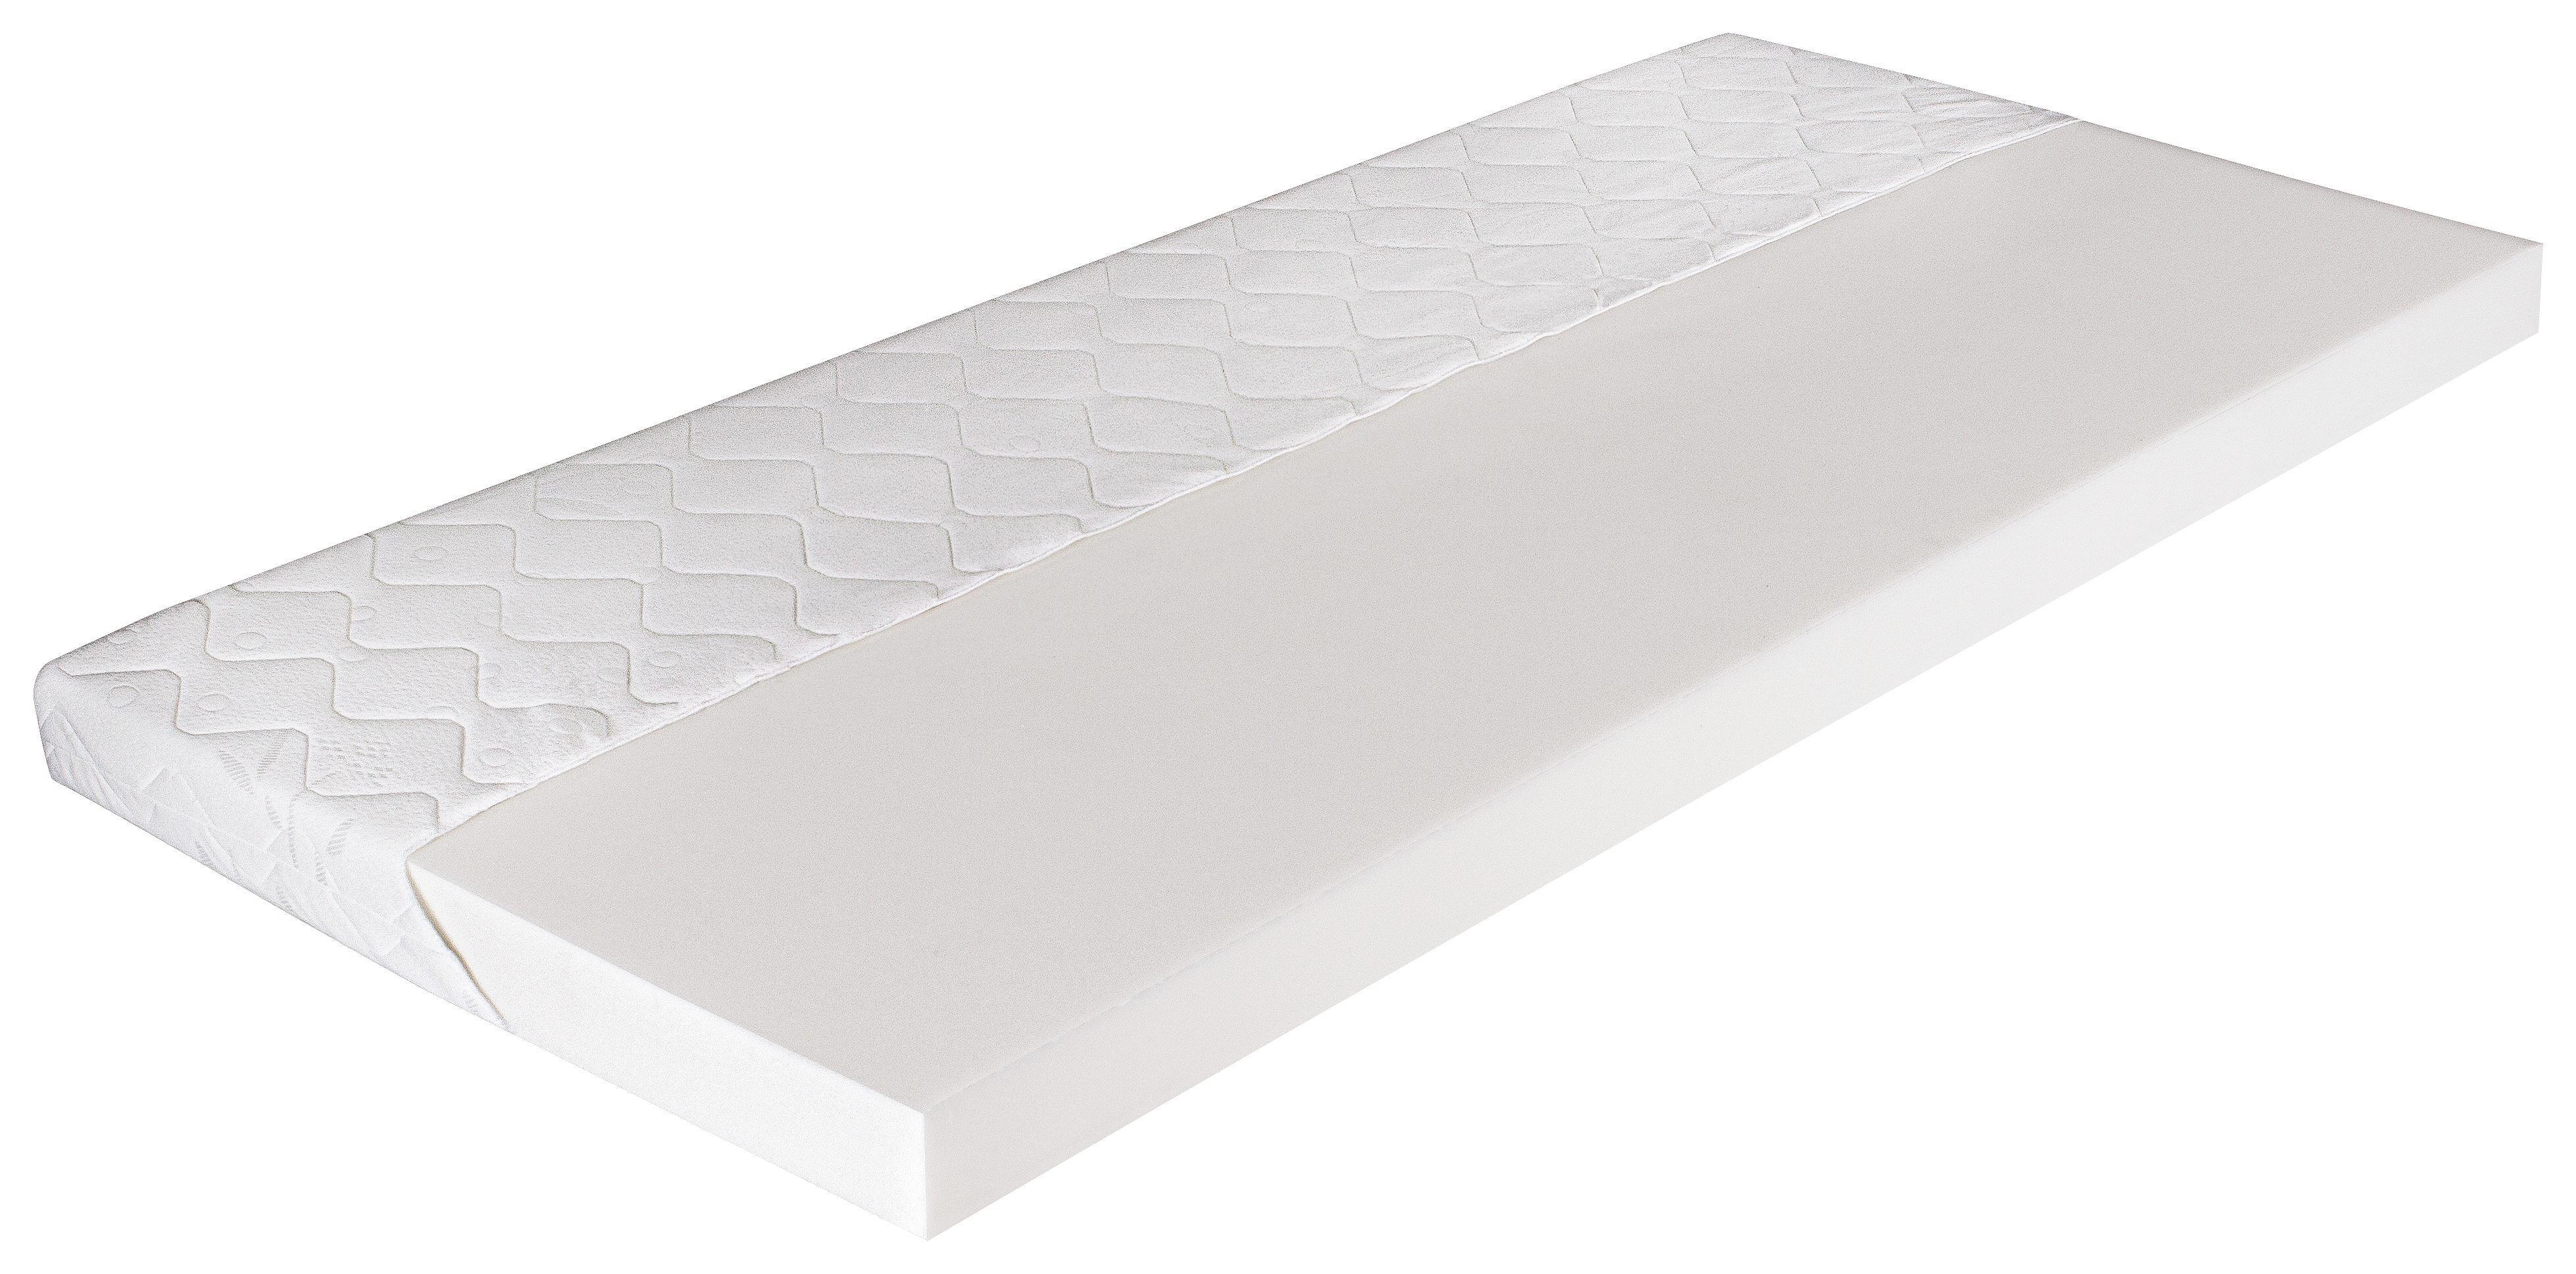 Matrac Viva Easy - sivá/biela, textil (200/90/10cm)